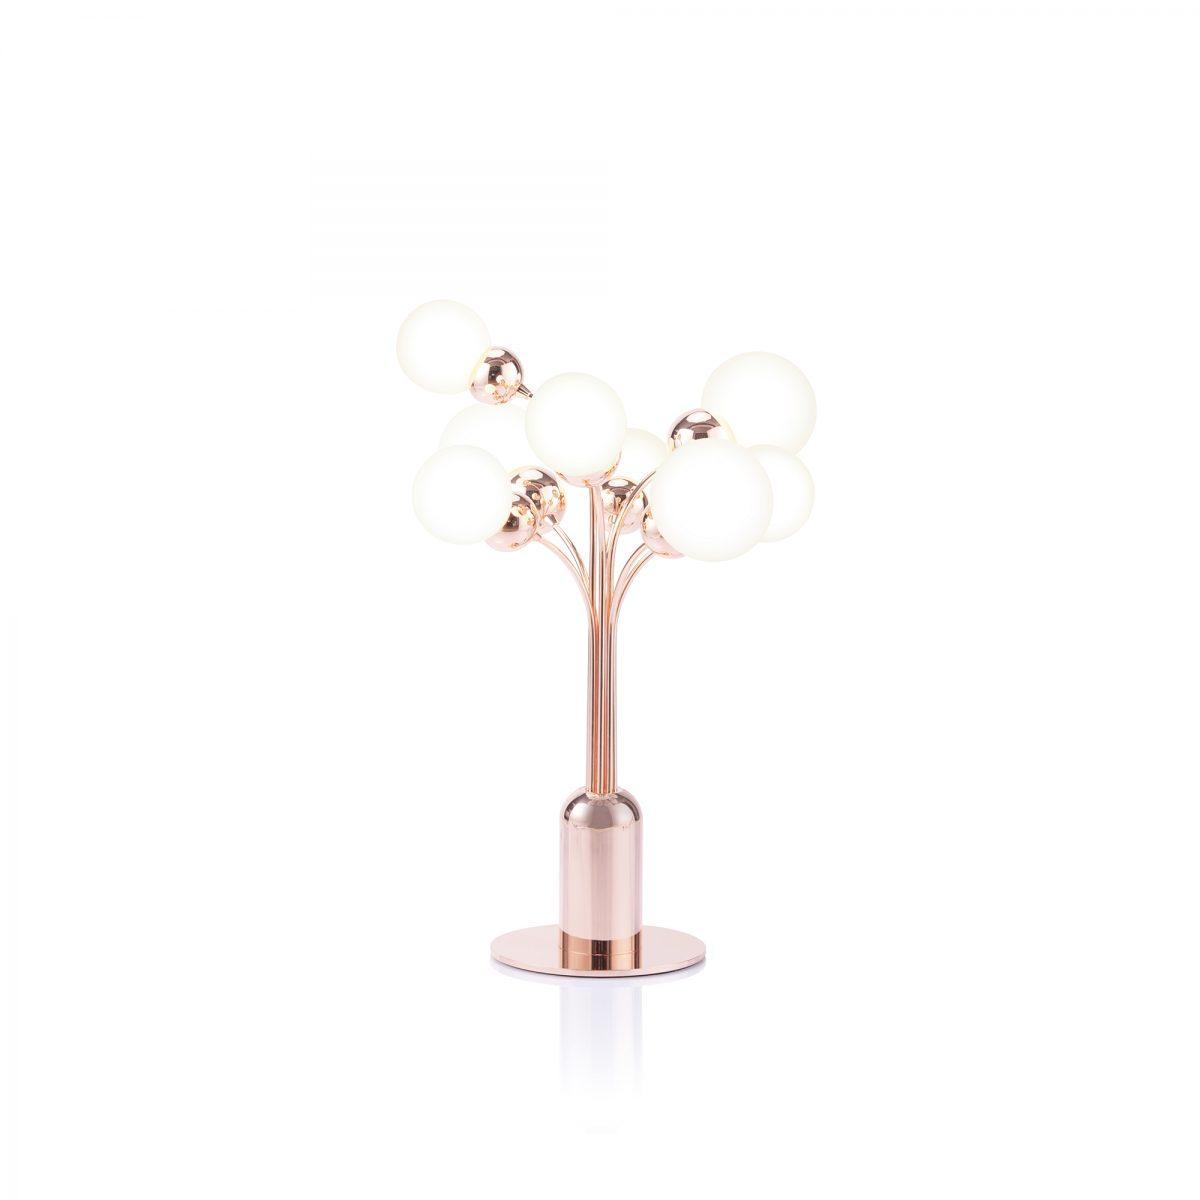 1-maison-dada-p.e.a.c.e-lighting-table-lamps-copper